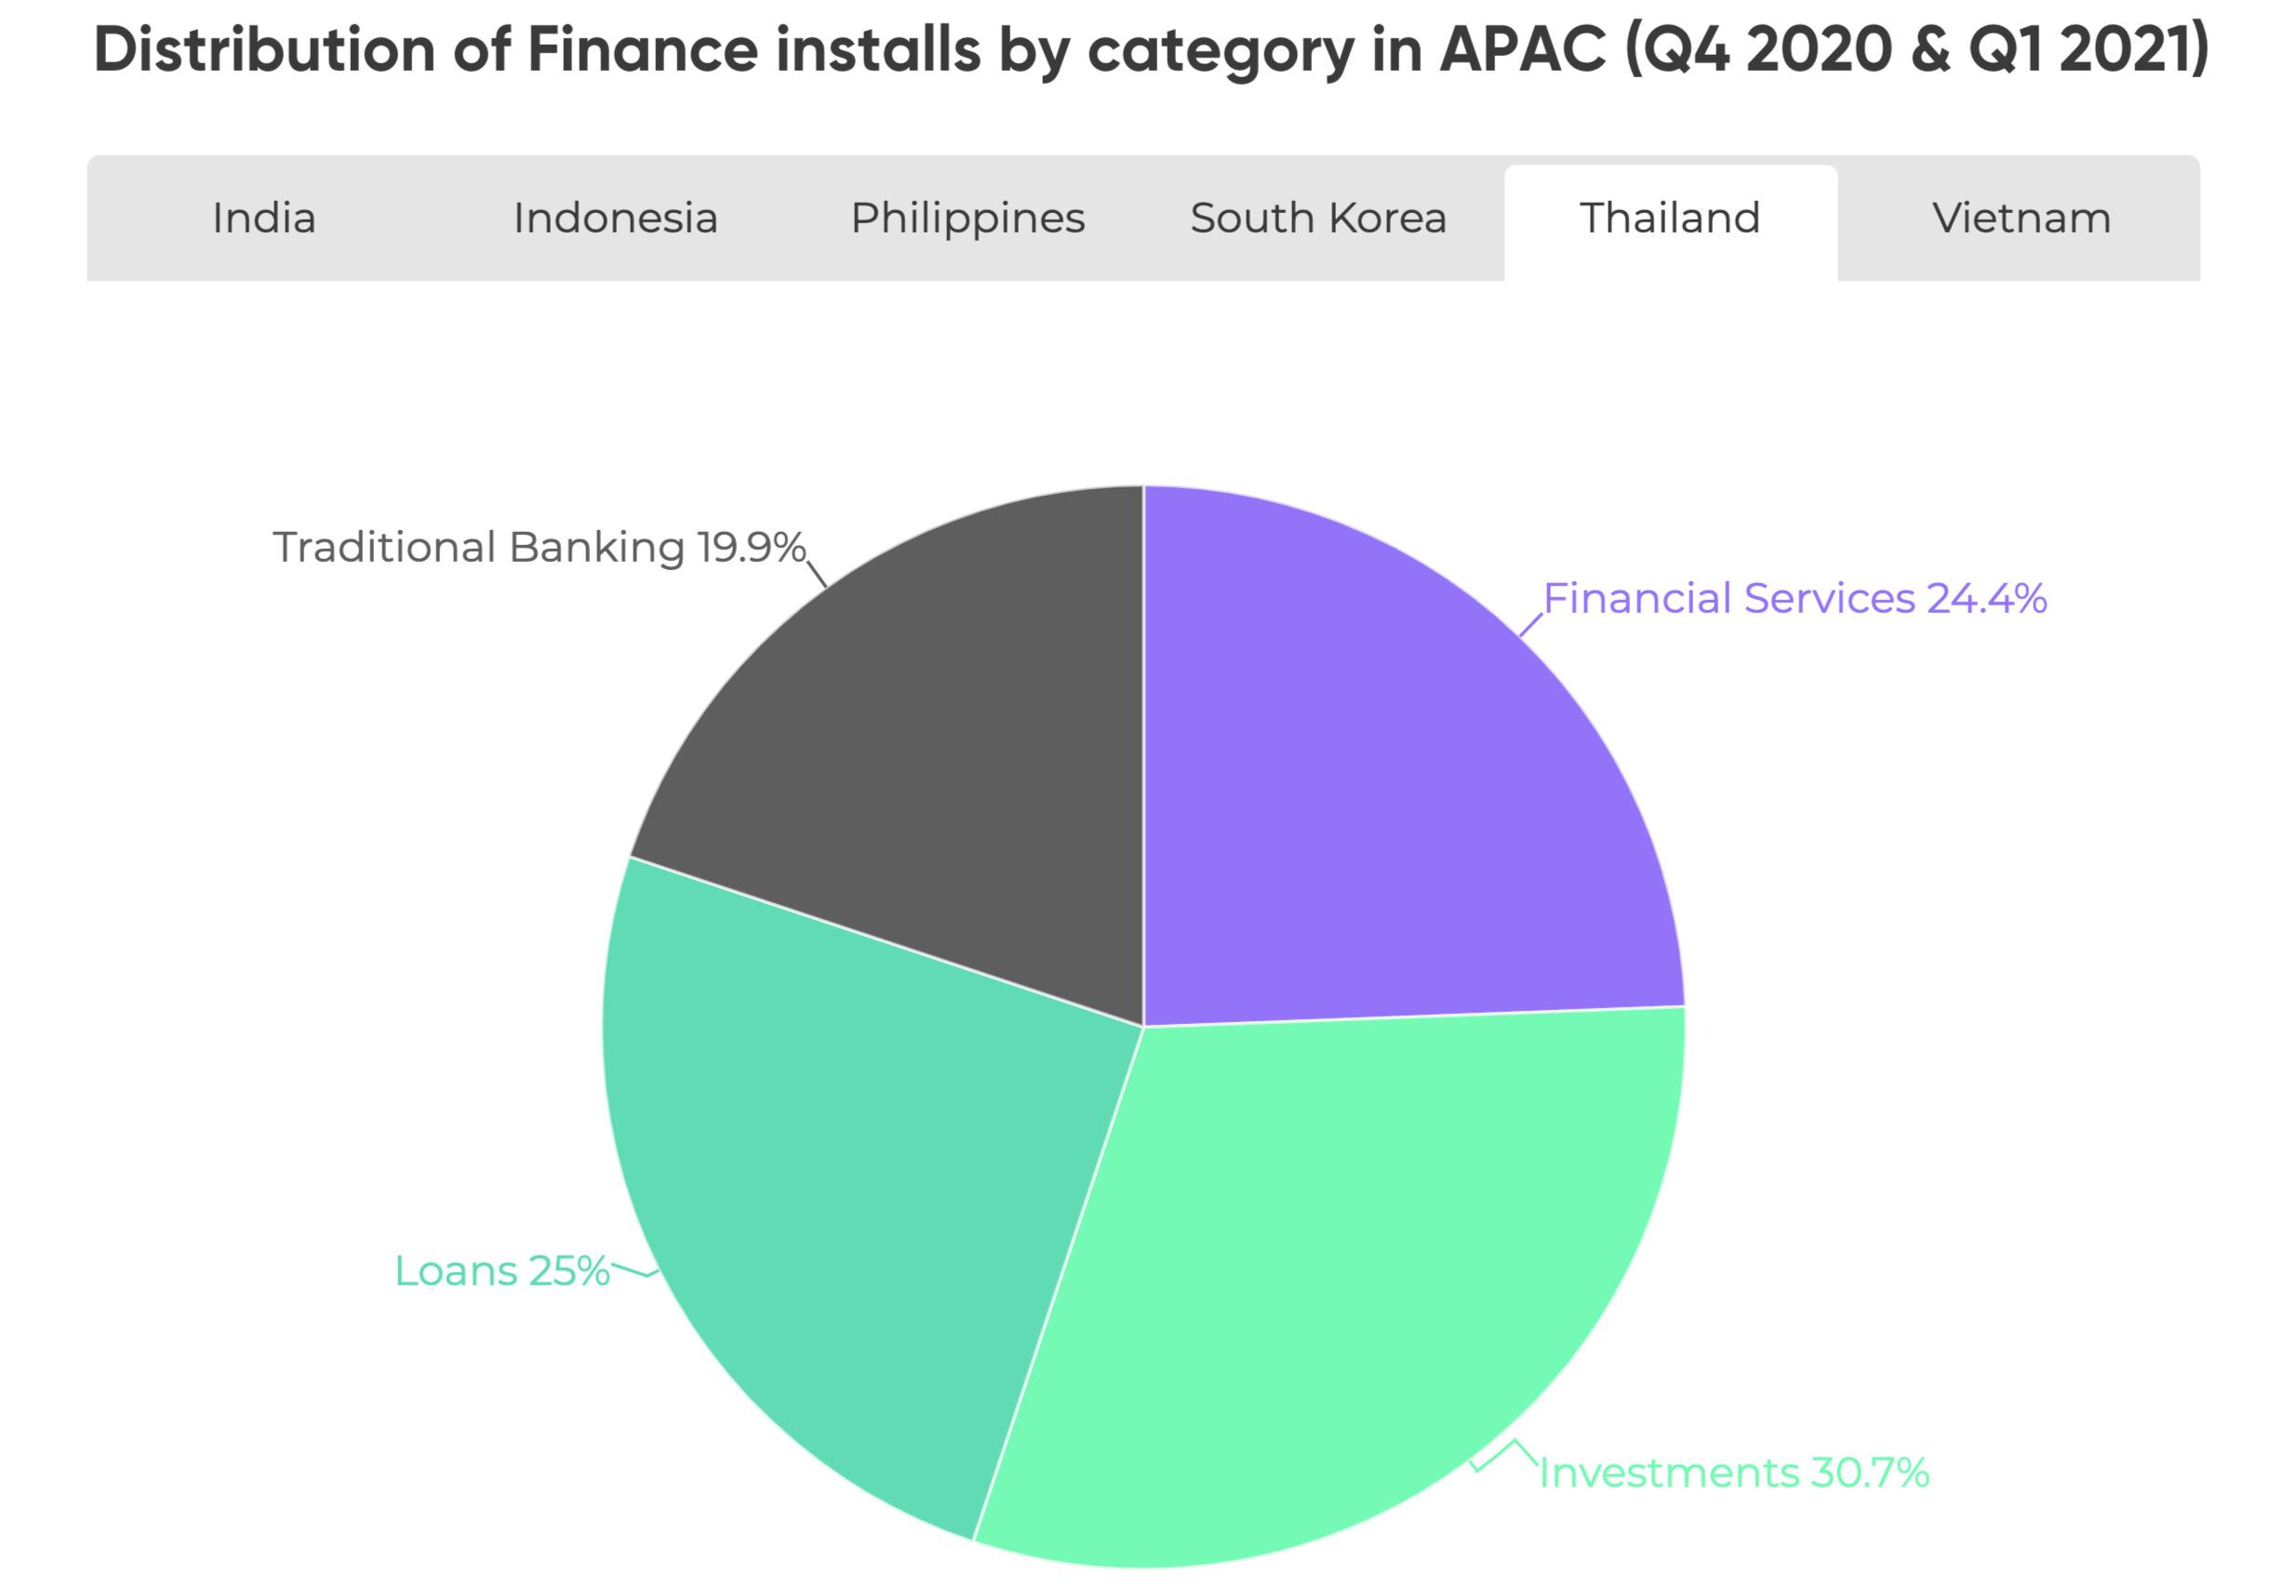 Distribution of Finance App Installs - TH